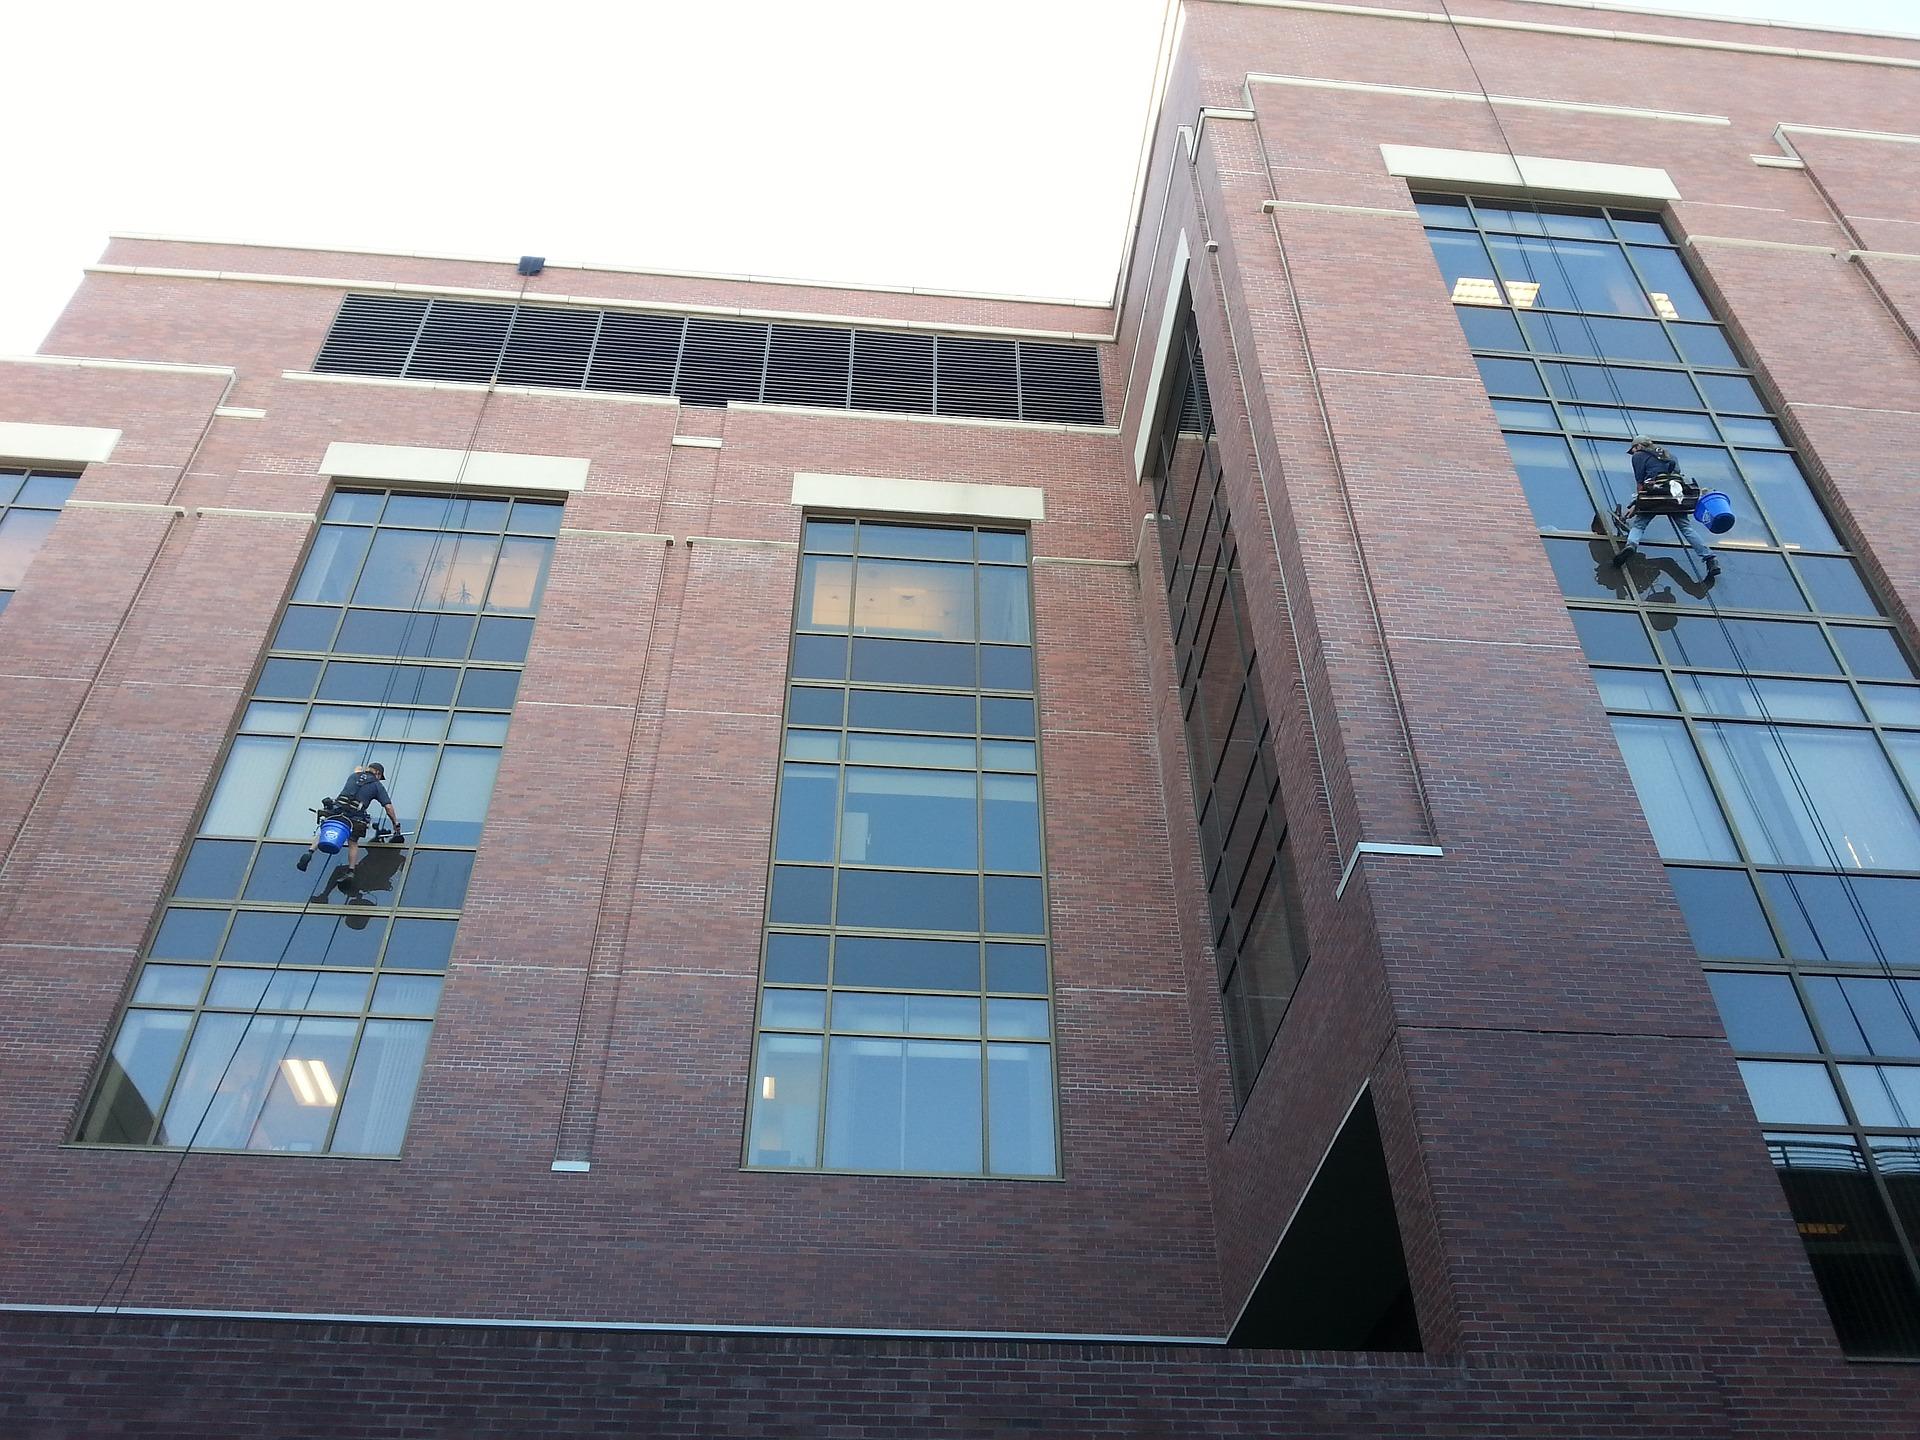 Faldsikring vinduespudser